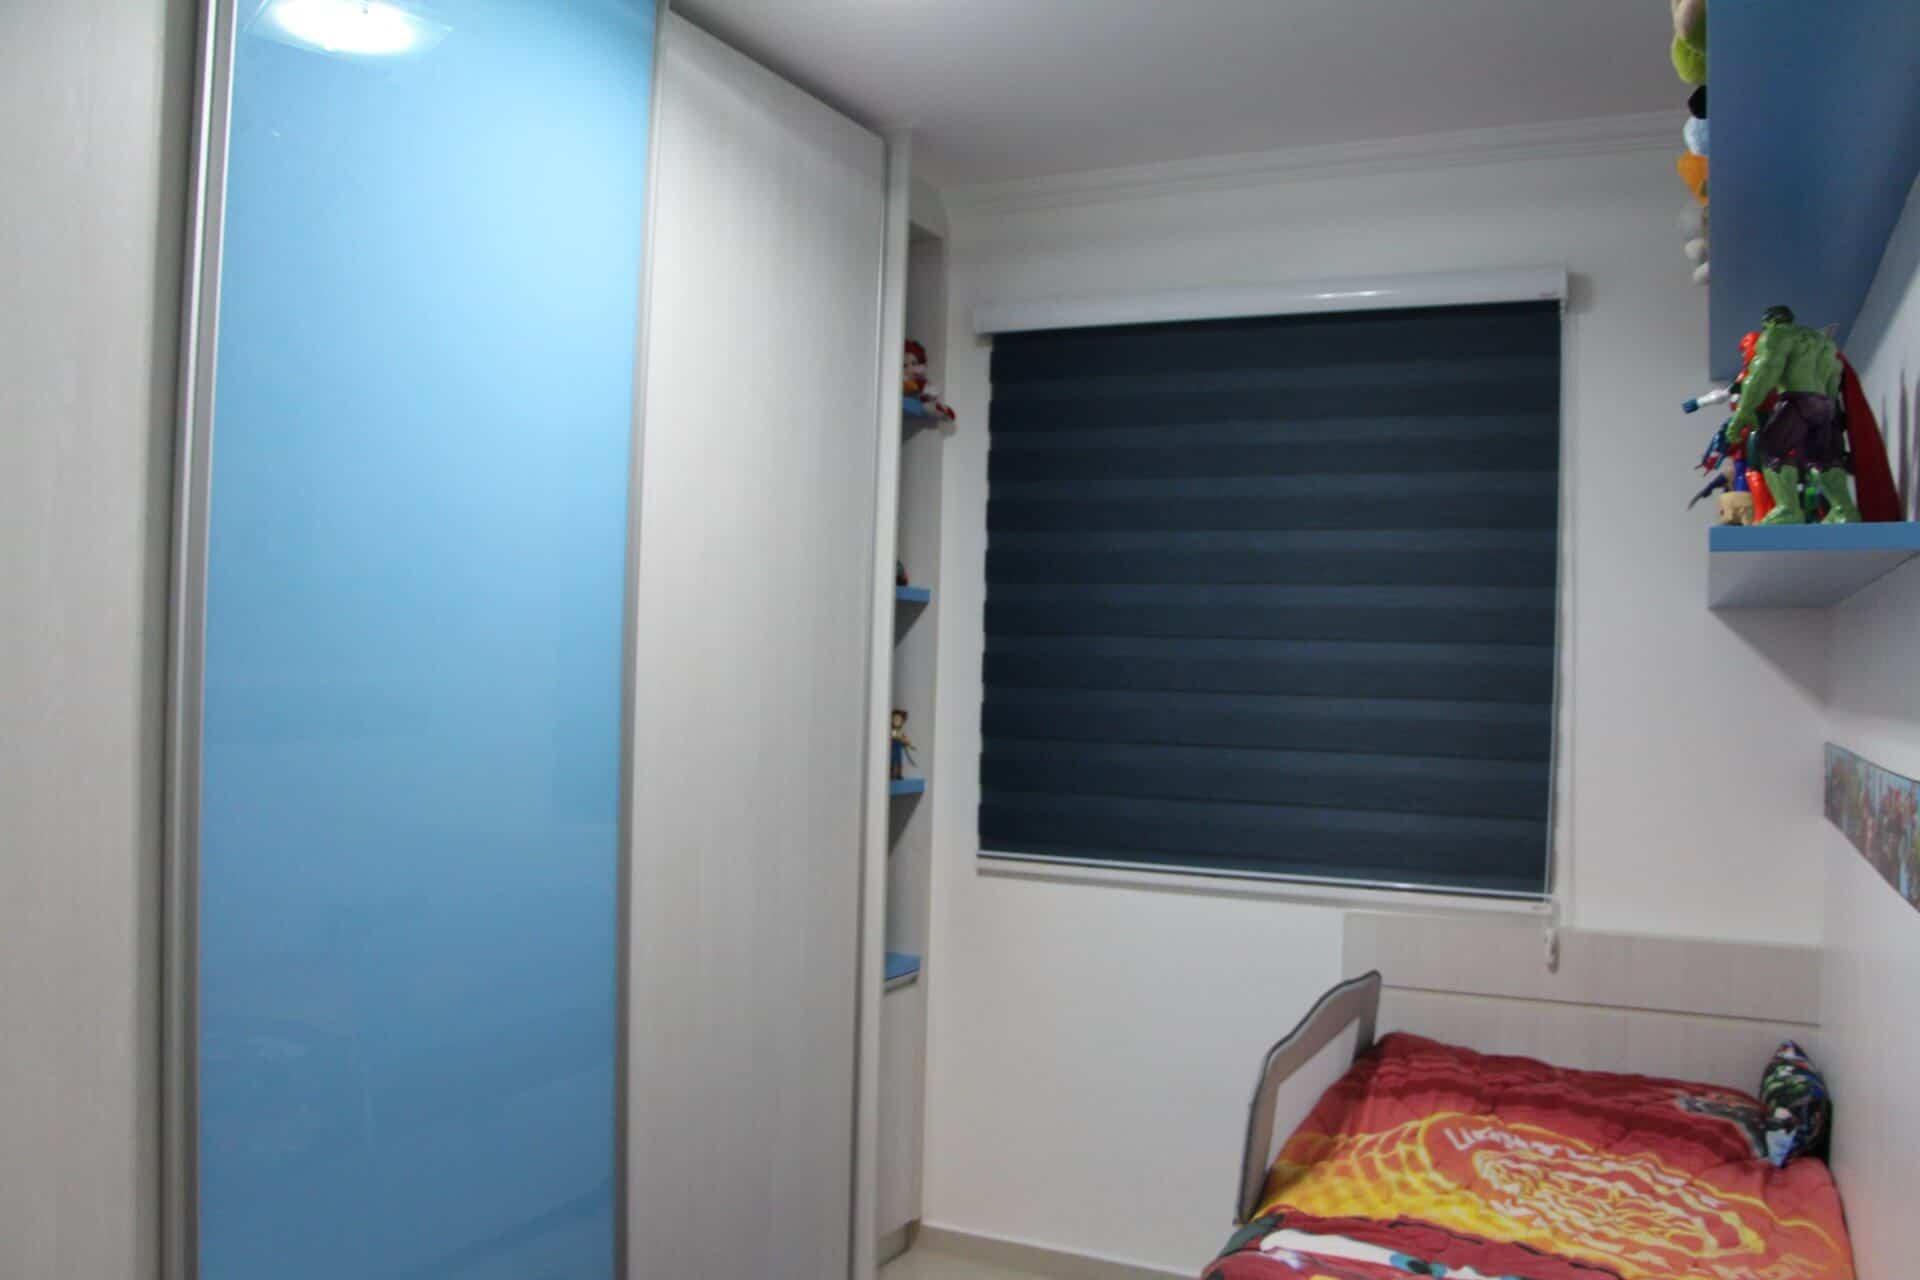 dormitorio-planejado_moveis-sob-medida-galeria-68